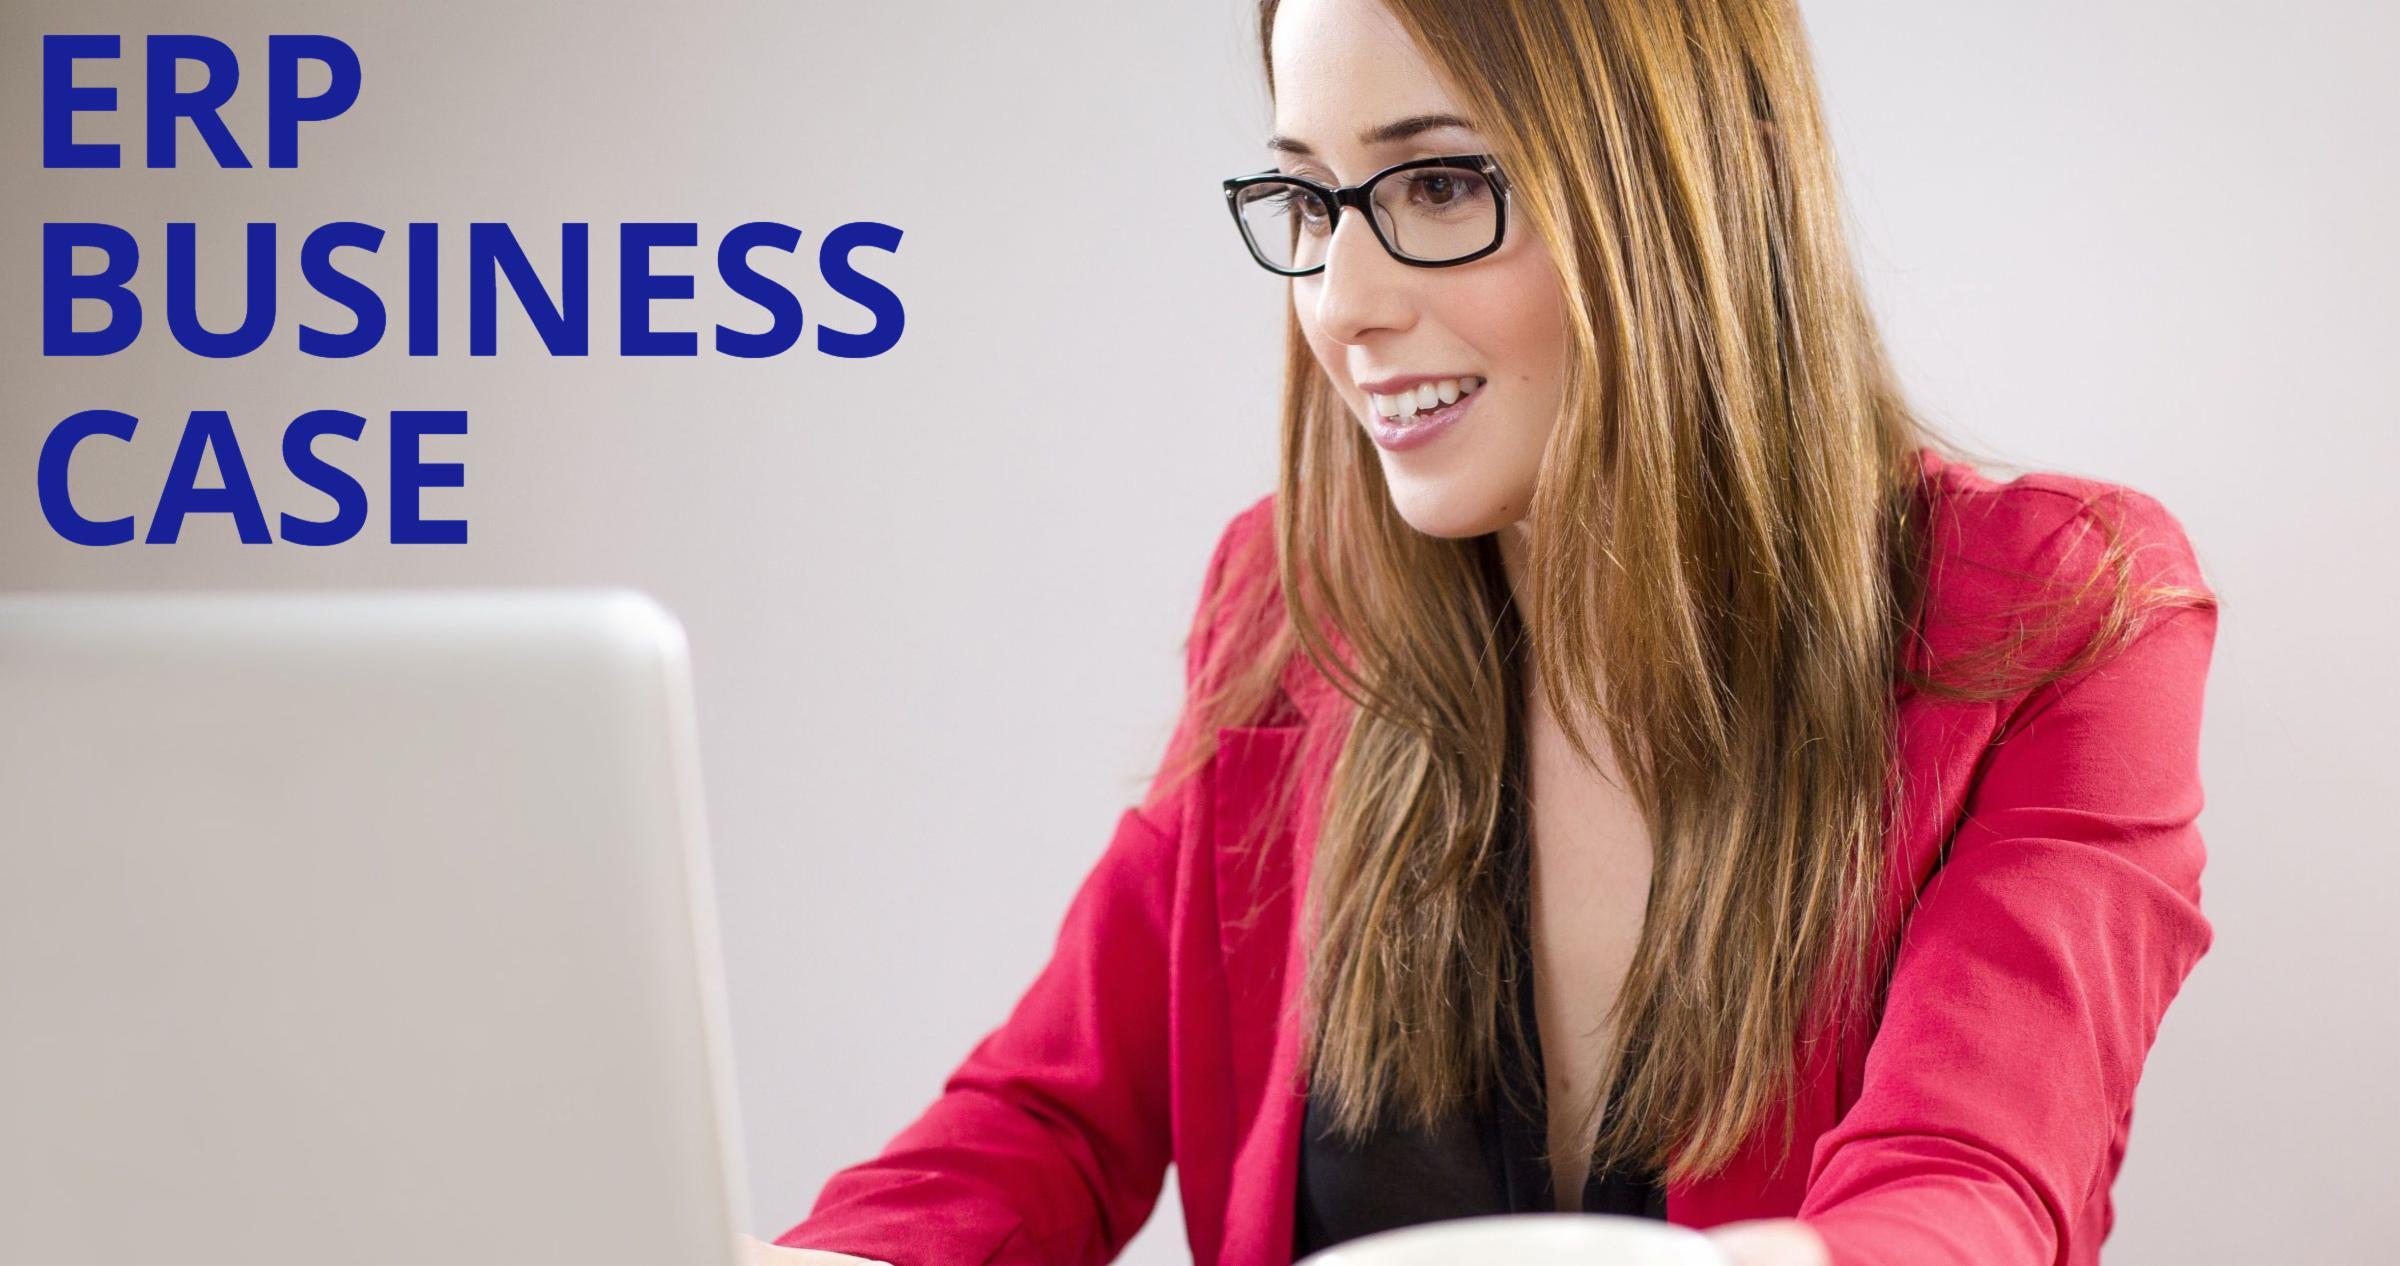 ERP Business Case